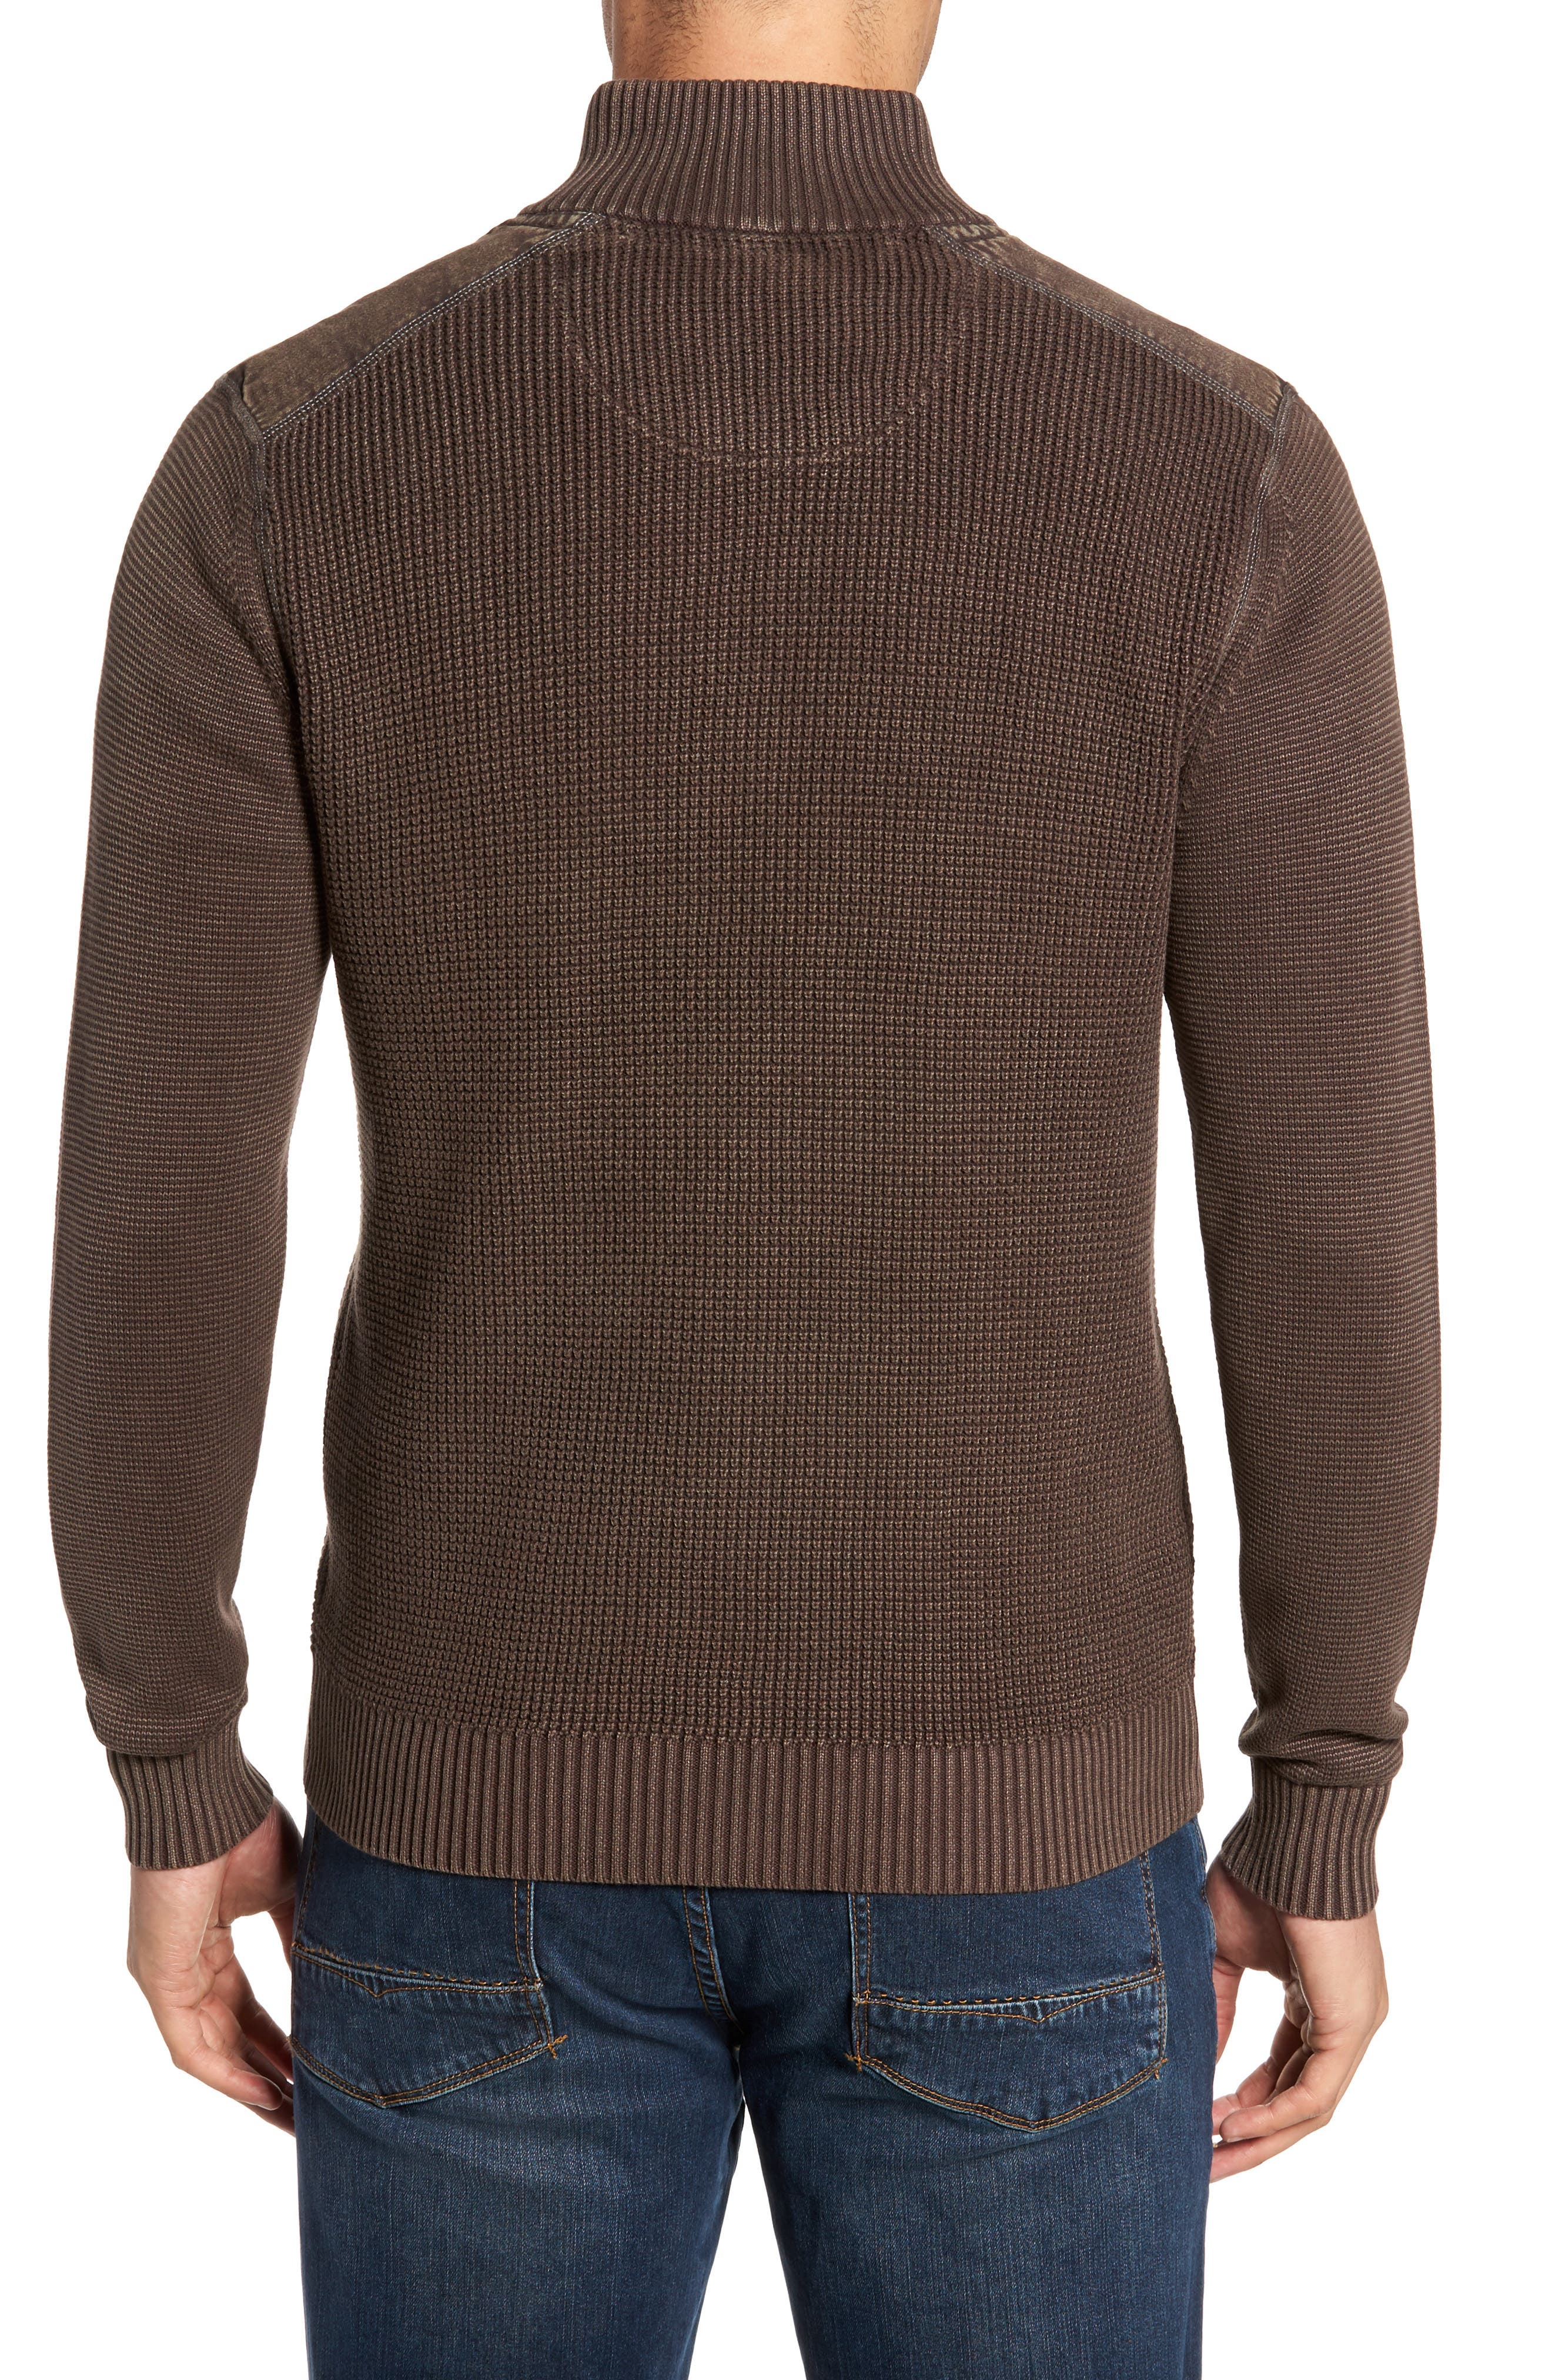 'Coastal Shores' Quarter Zip Sweater,                             Alternate thumbnail 2, color,                             Tilth